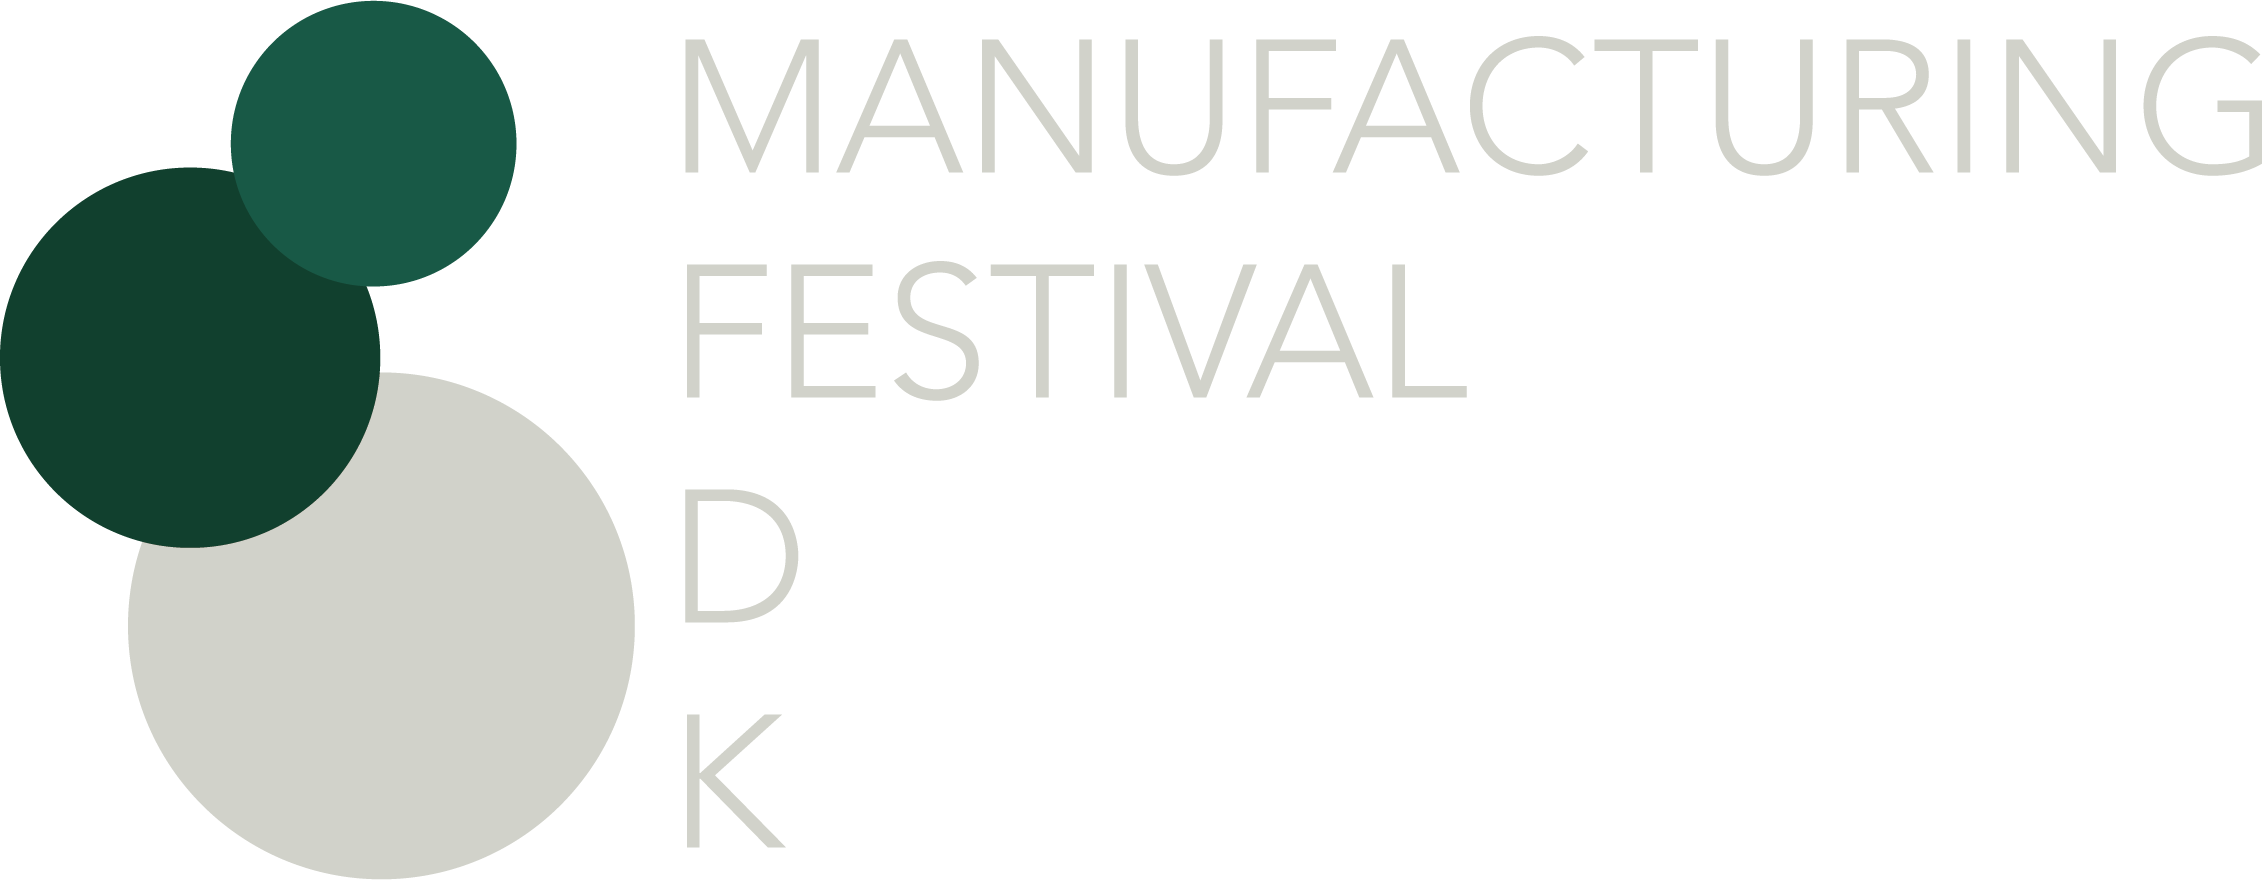 Manufacturing Festival